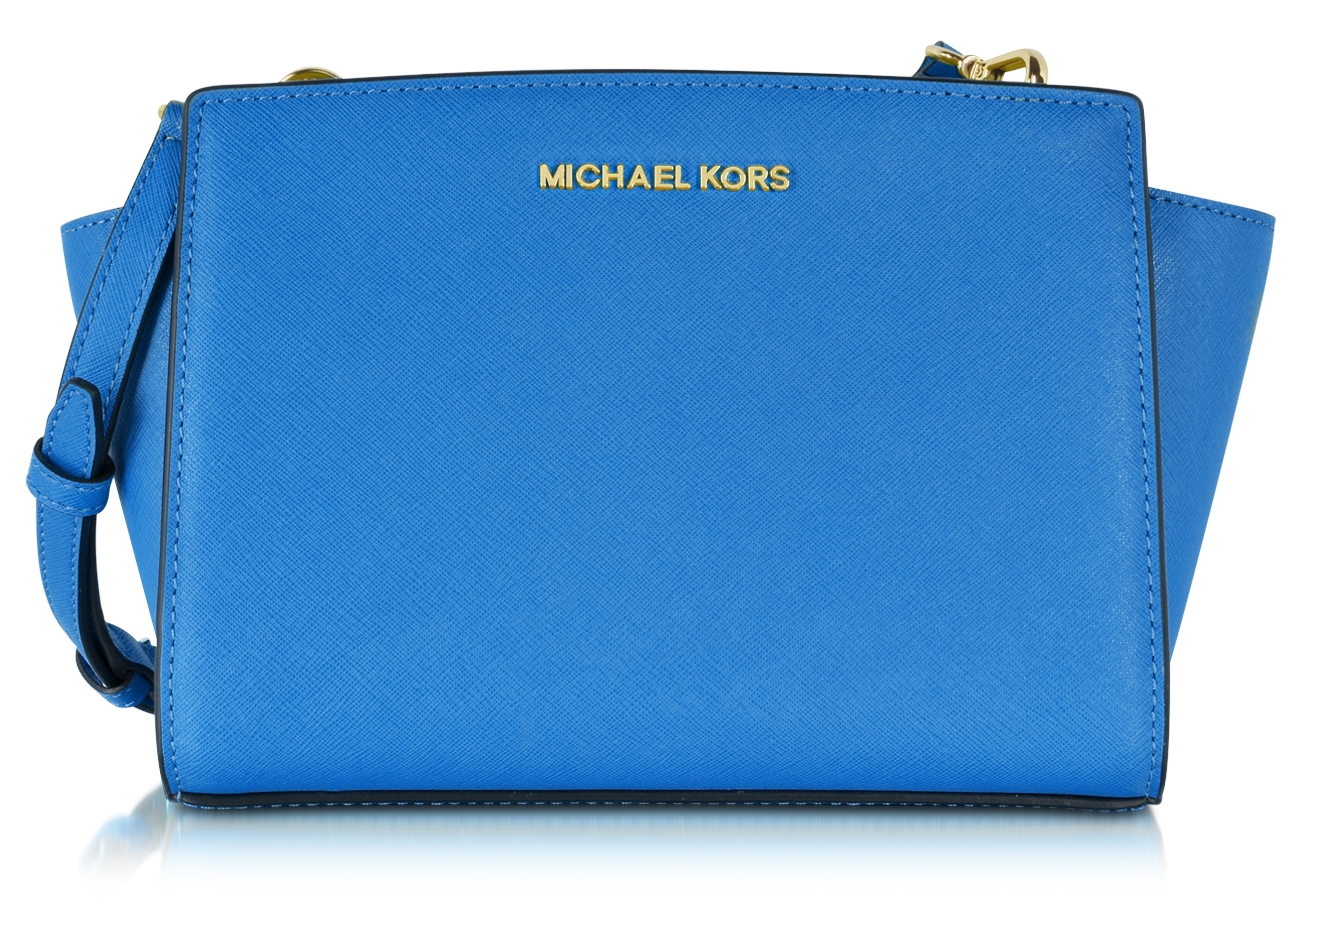 11bda658b7c670 Michael Kors heritage blue Selma Medium Saffiano Leather Messenger Bag